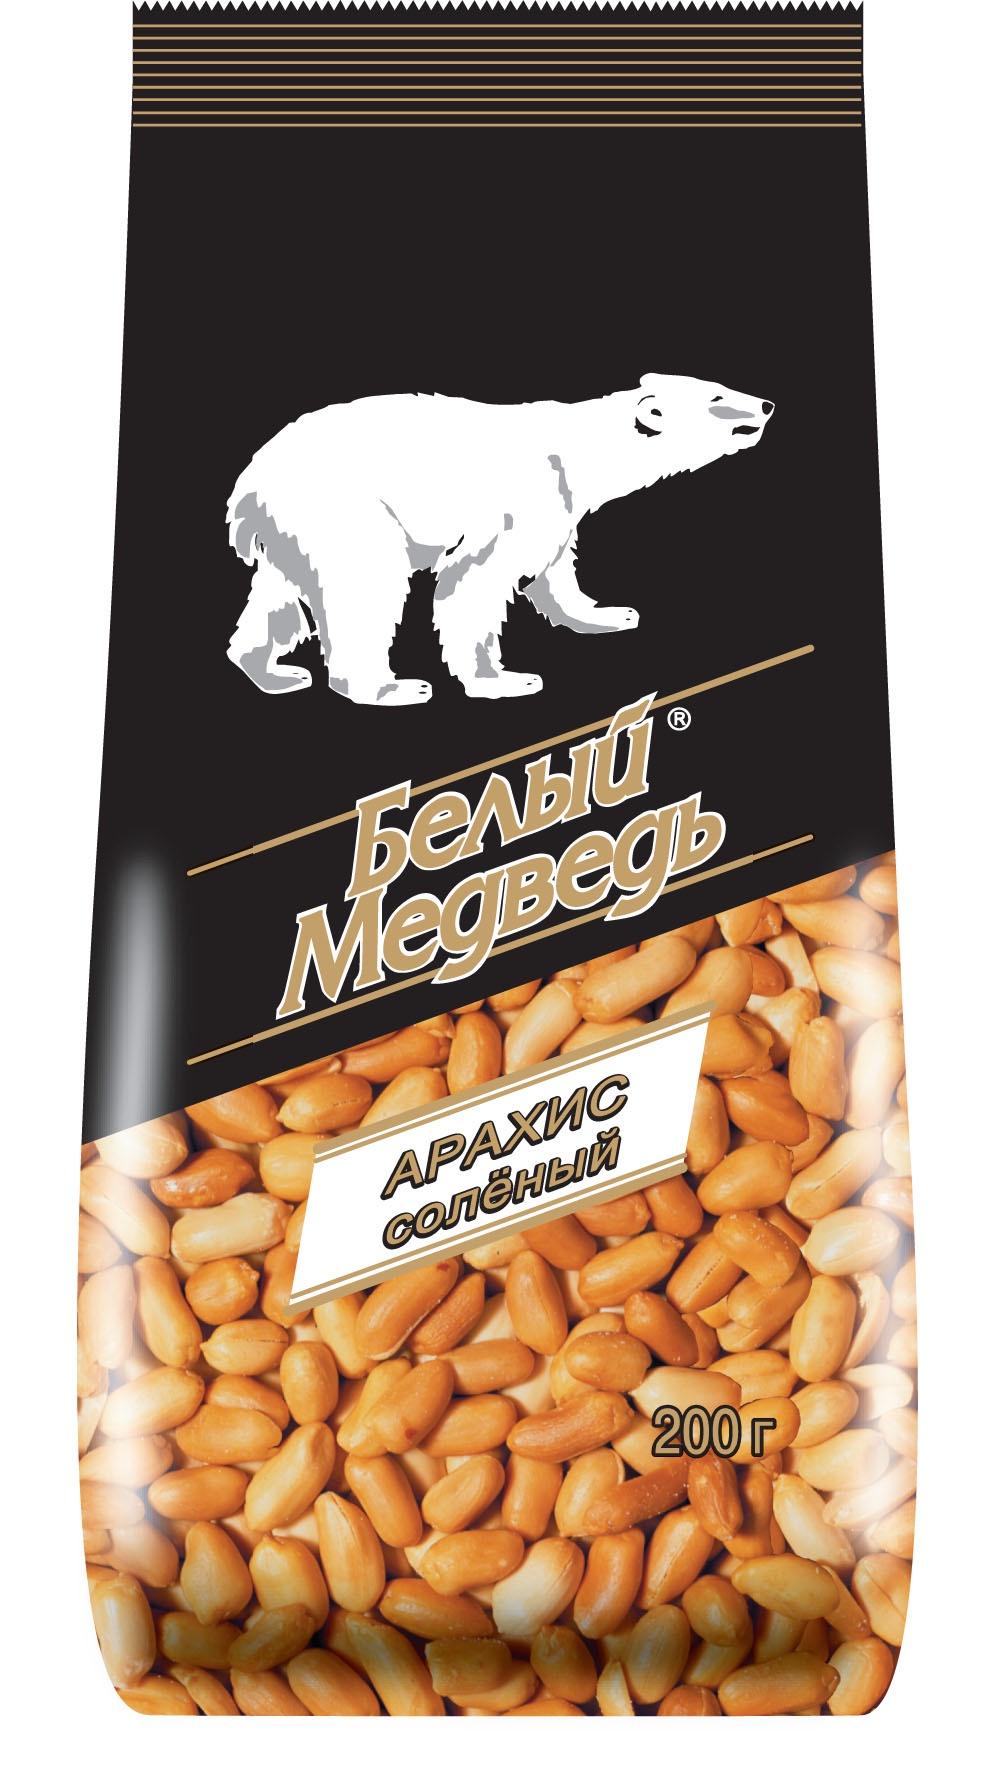 Арахис соленый жареный  Белый медведь 200 гр peyman арахис жареный соленый 40 г